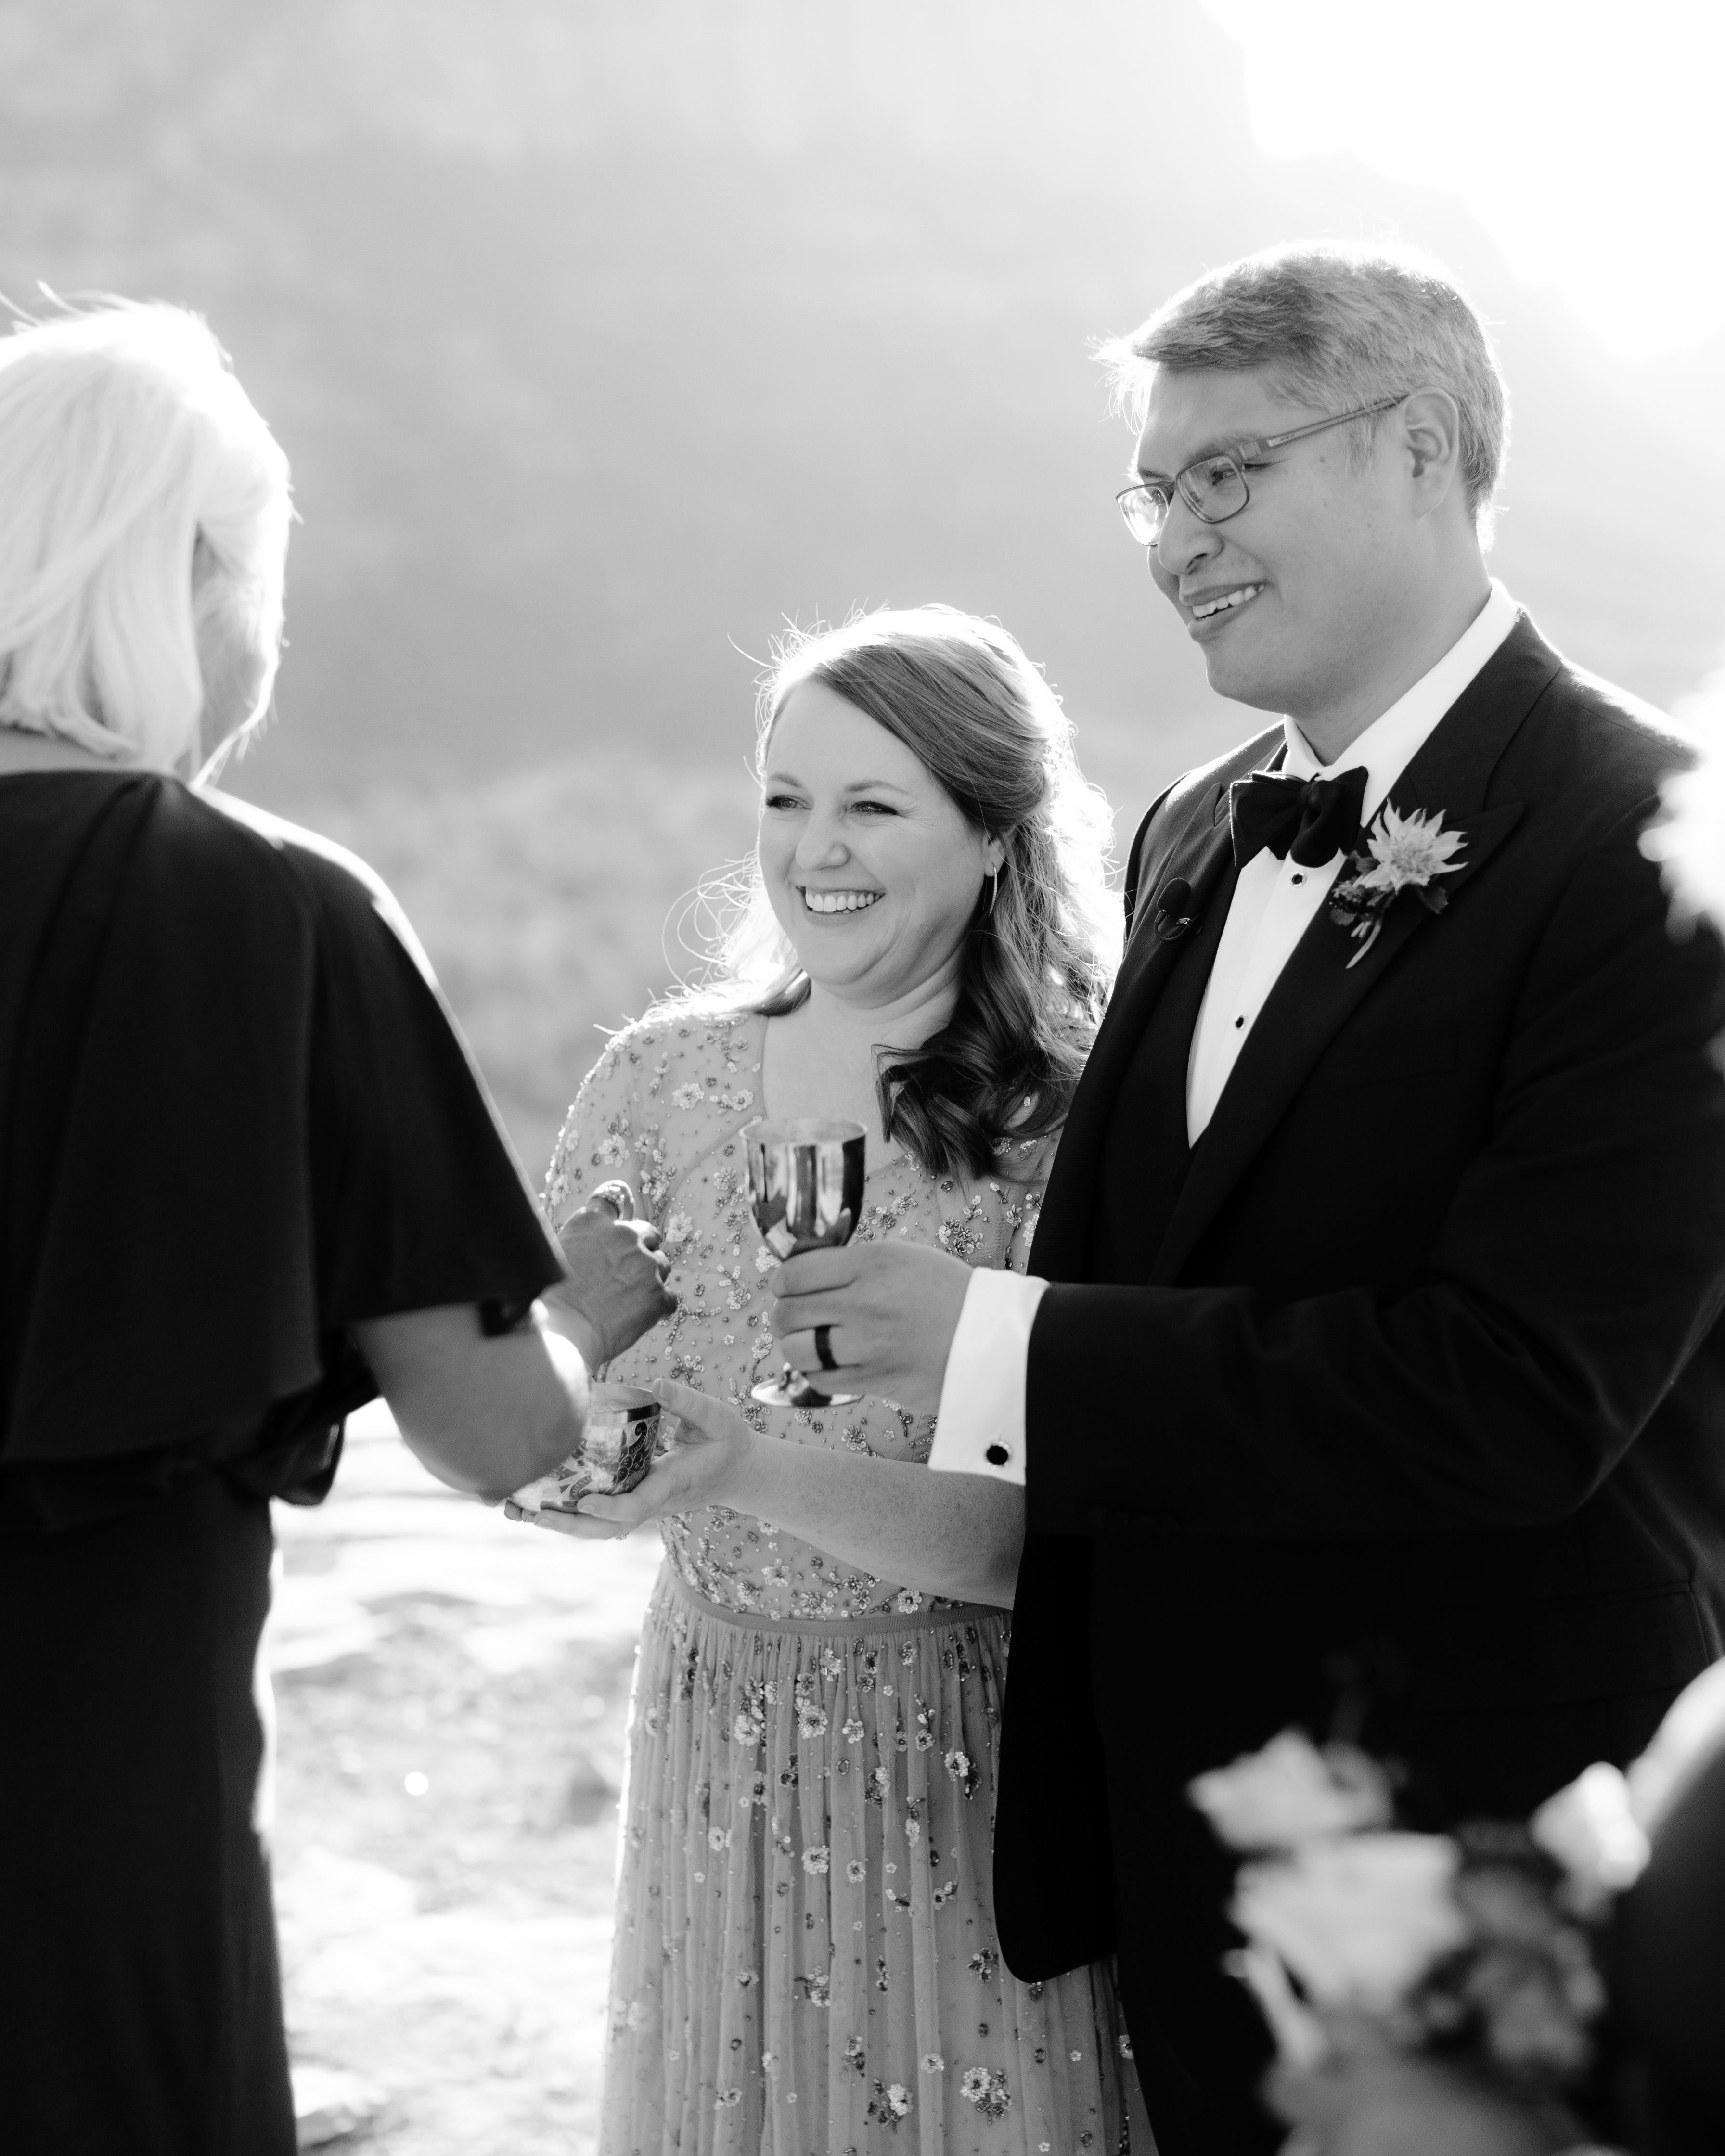 stefanie terrel wedding bread wine couple officiant